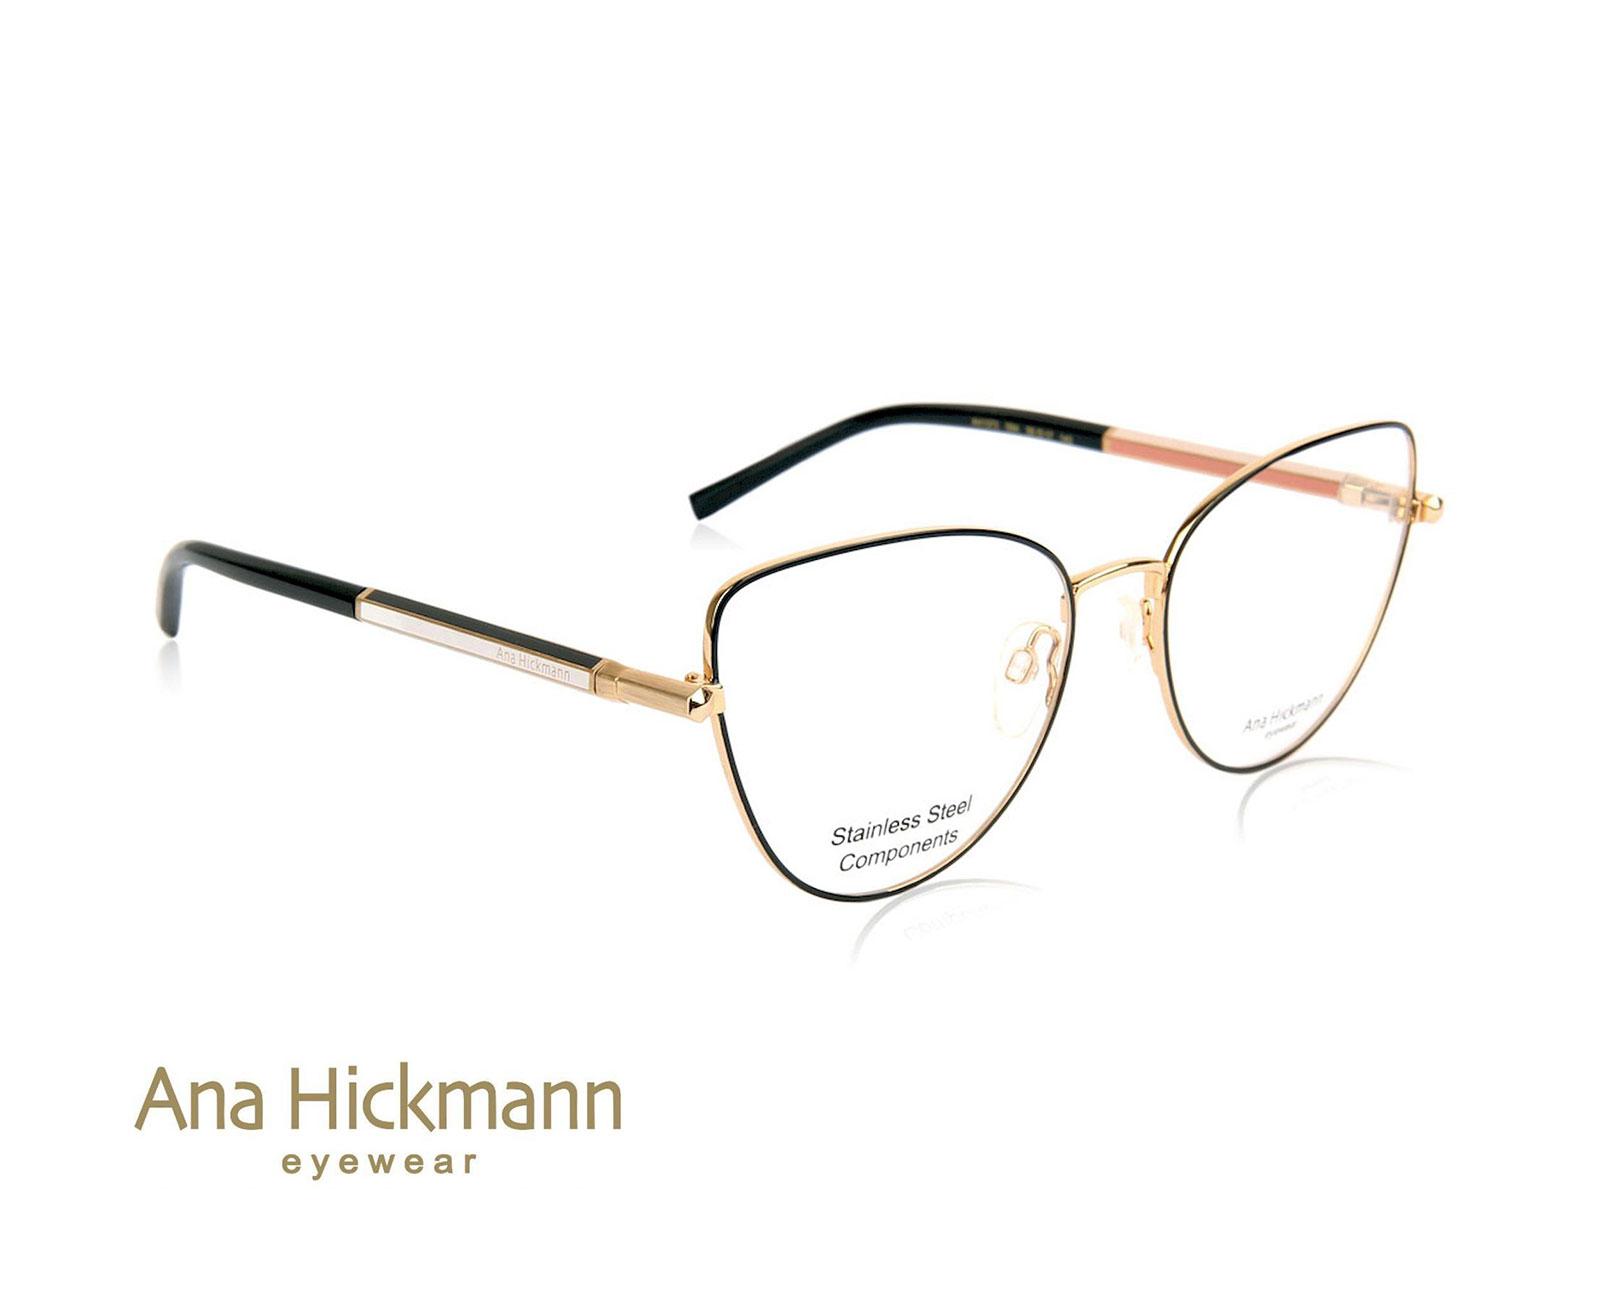 Ana Hickmann AH1372 in Gold/Matte Black